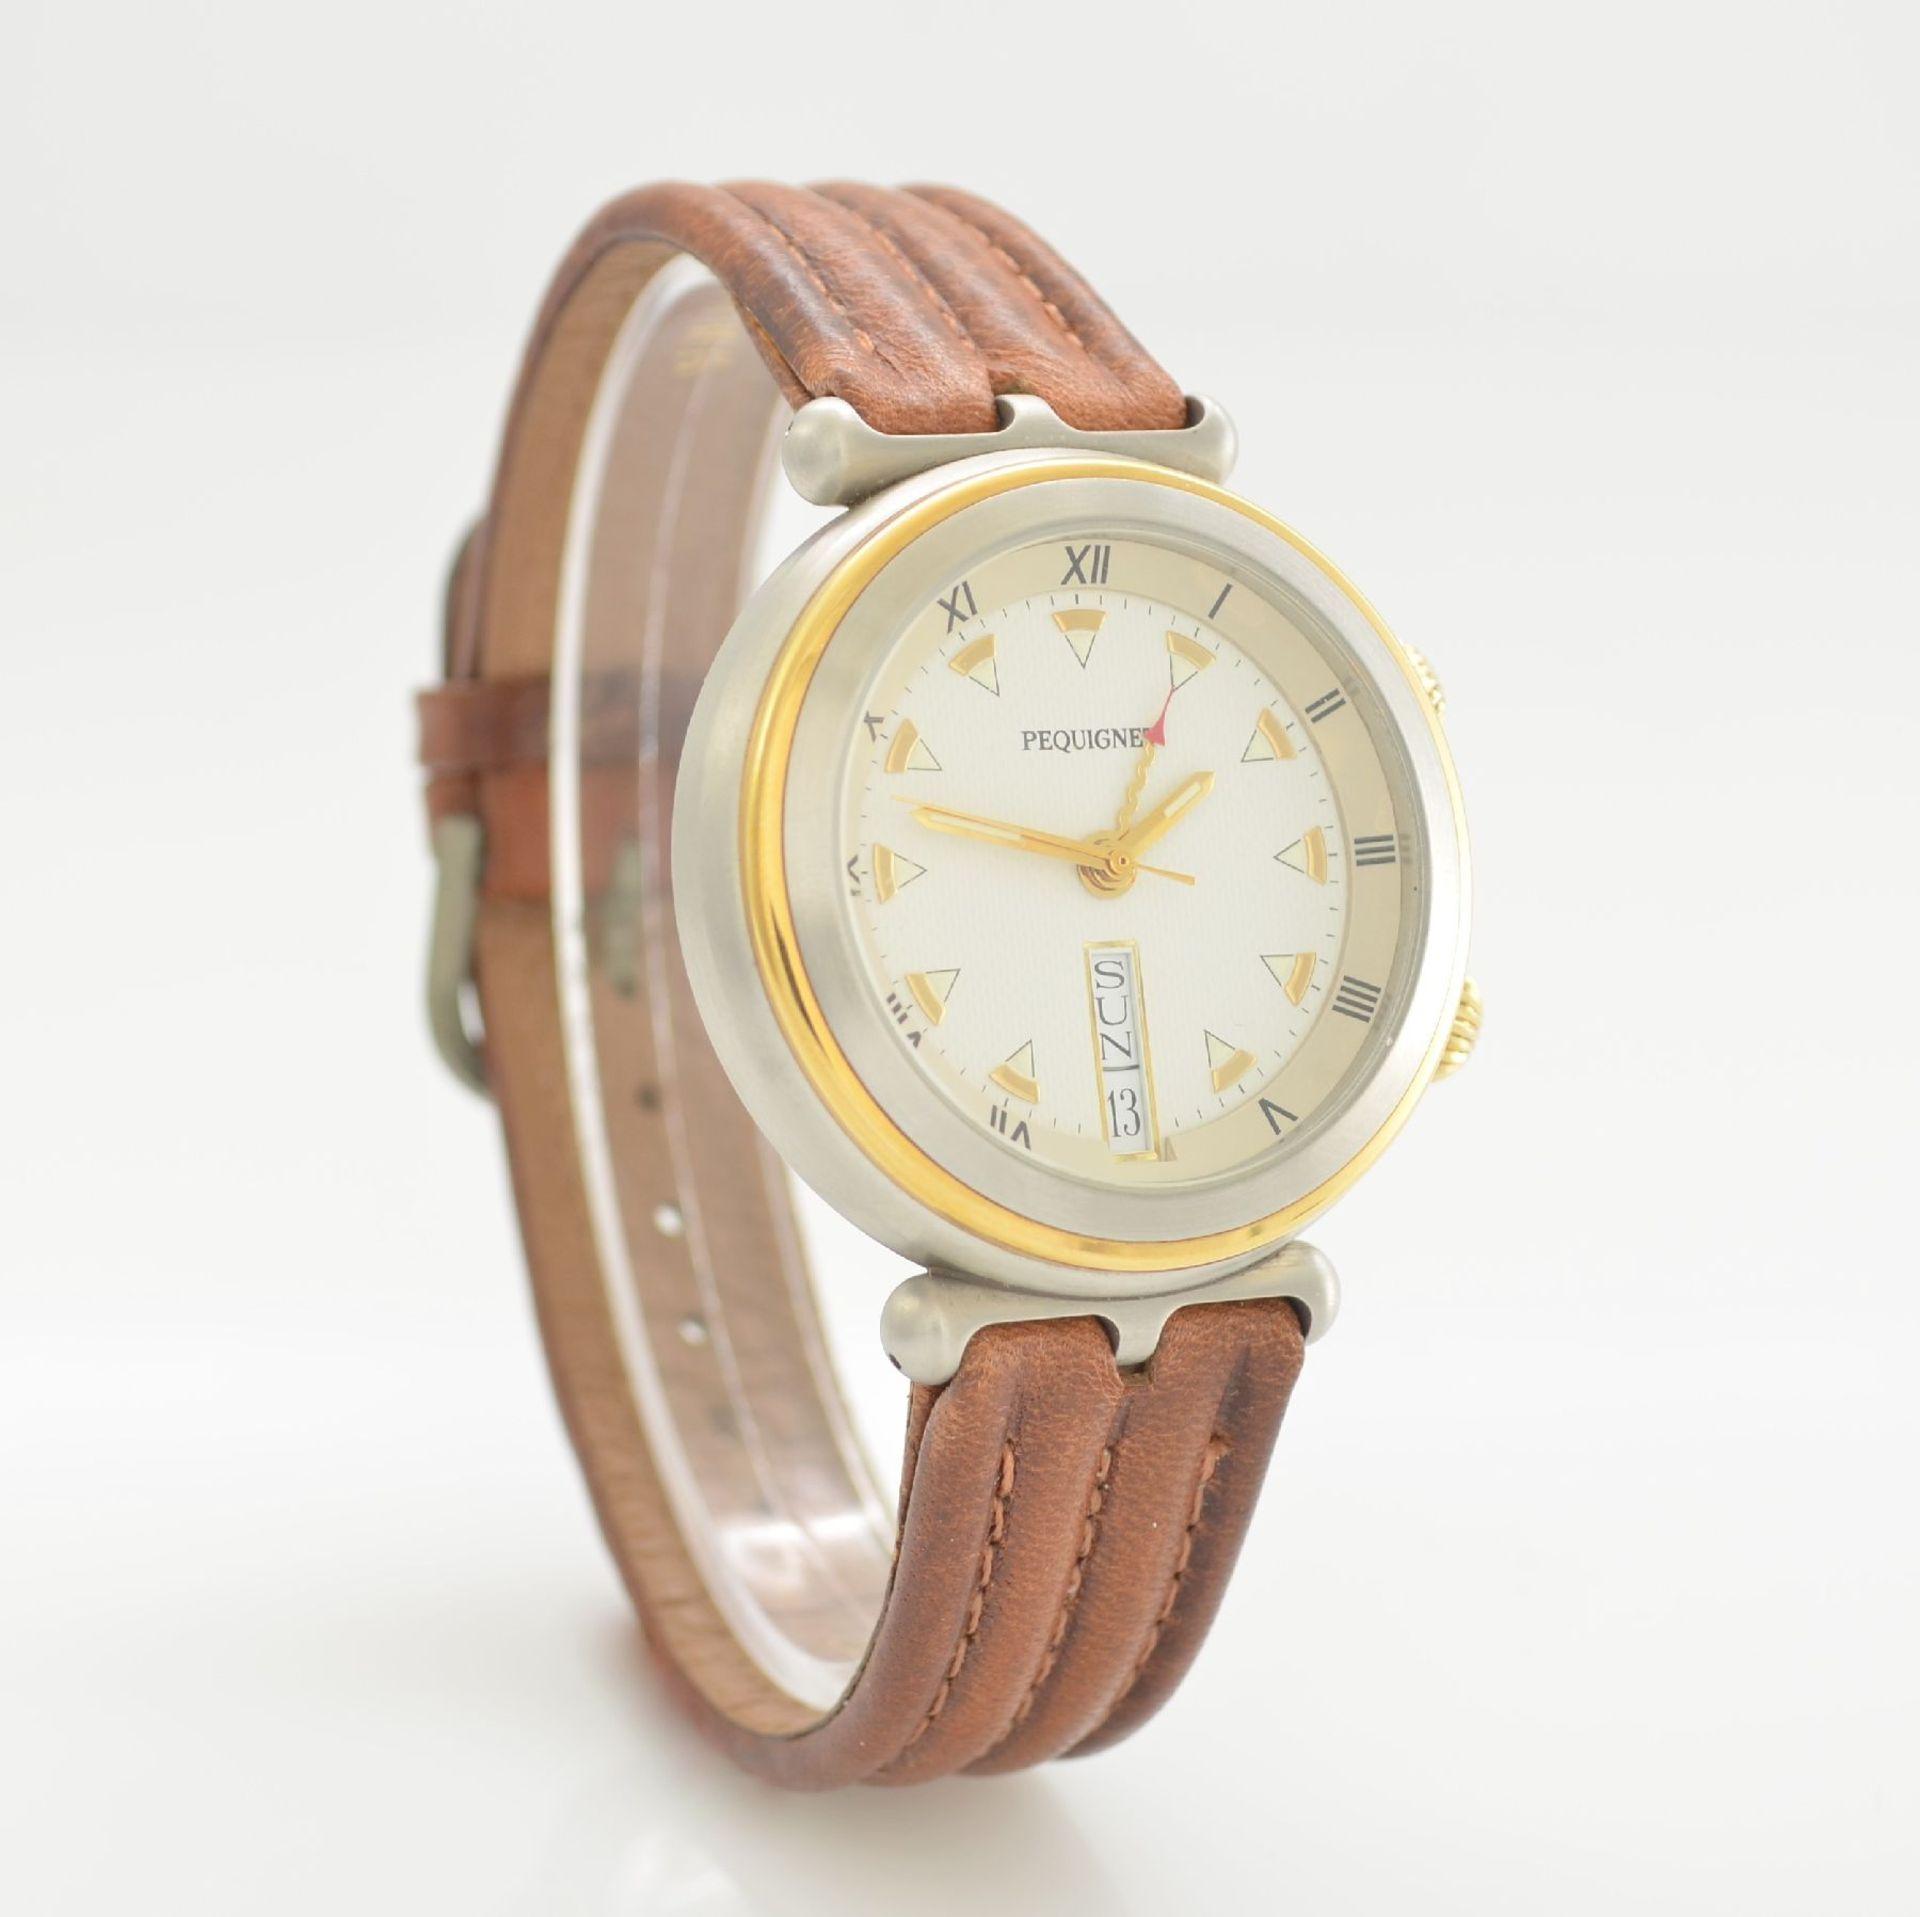 BUCHERER Chronometer Herrenarmbanduhr Archimedes in Edelstahl, Automatik, Gliederband m. dopp. - Bild 4 aus 7